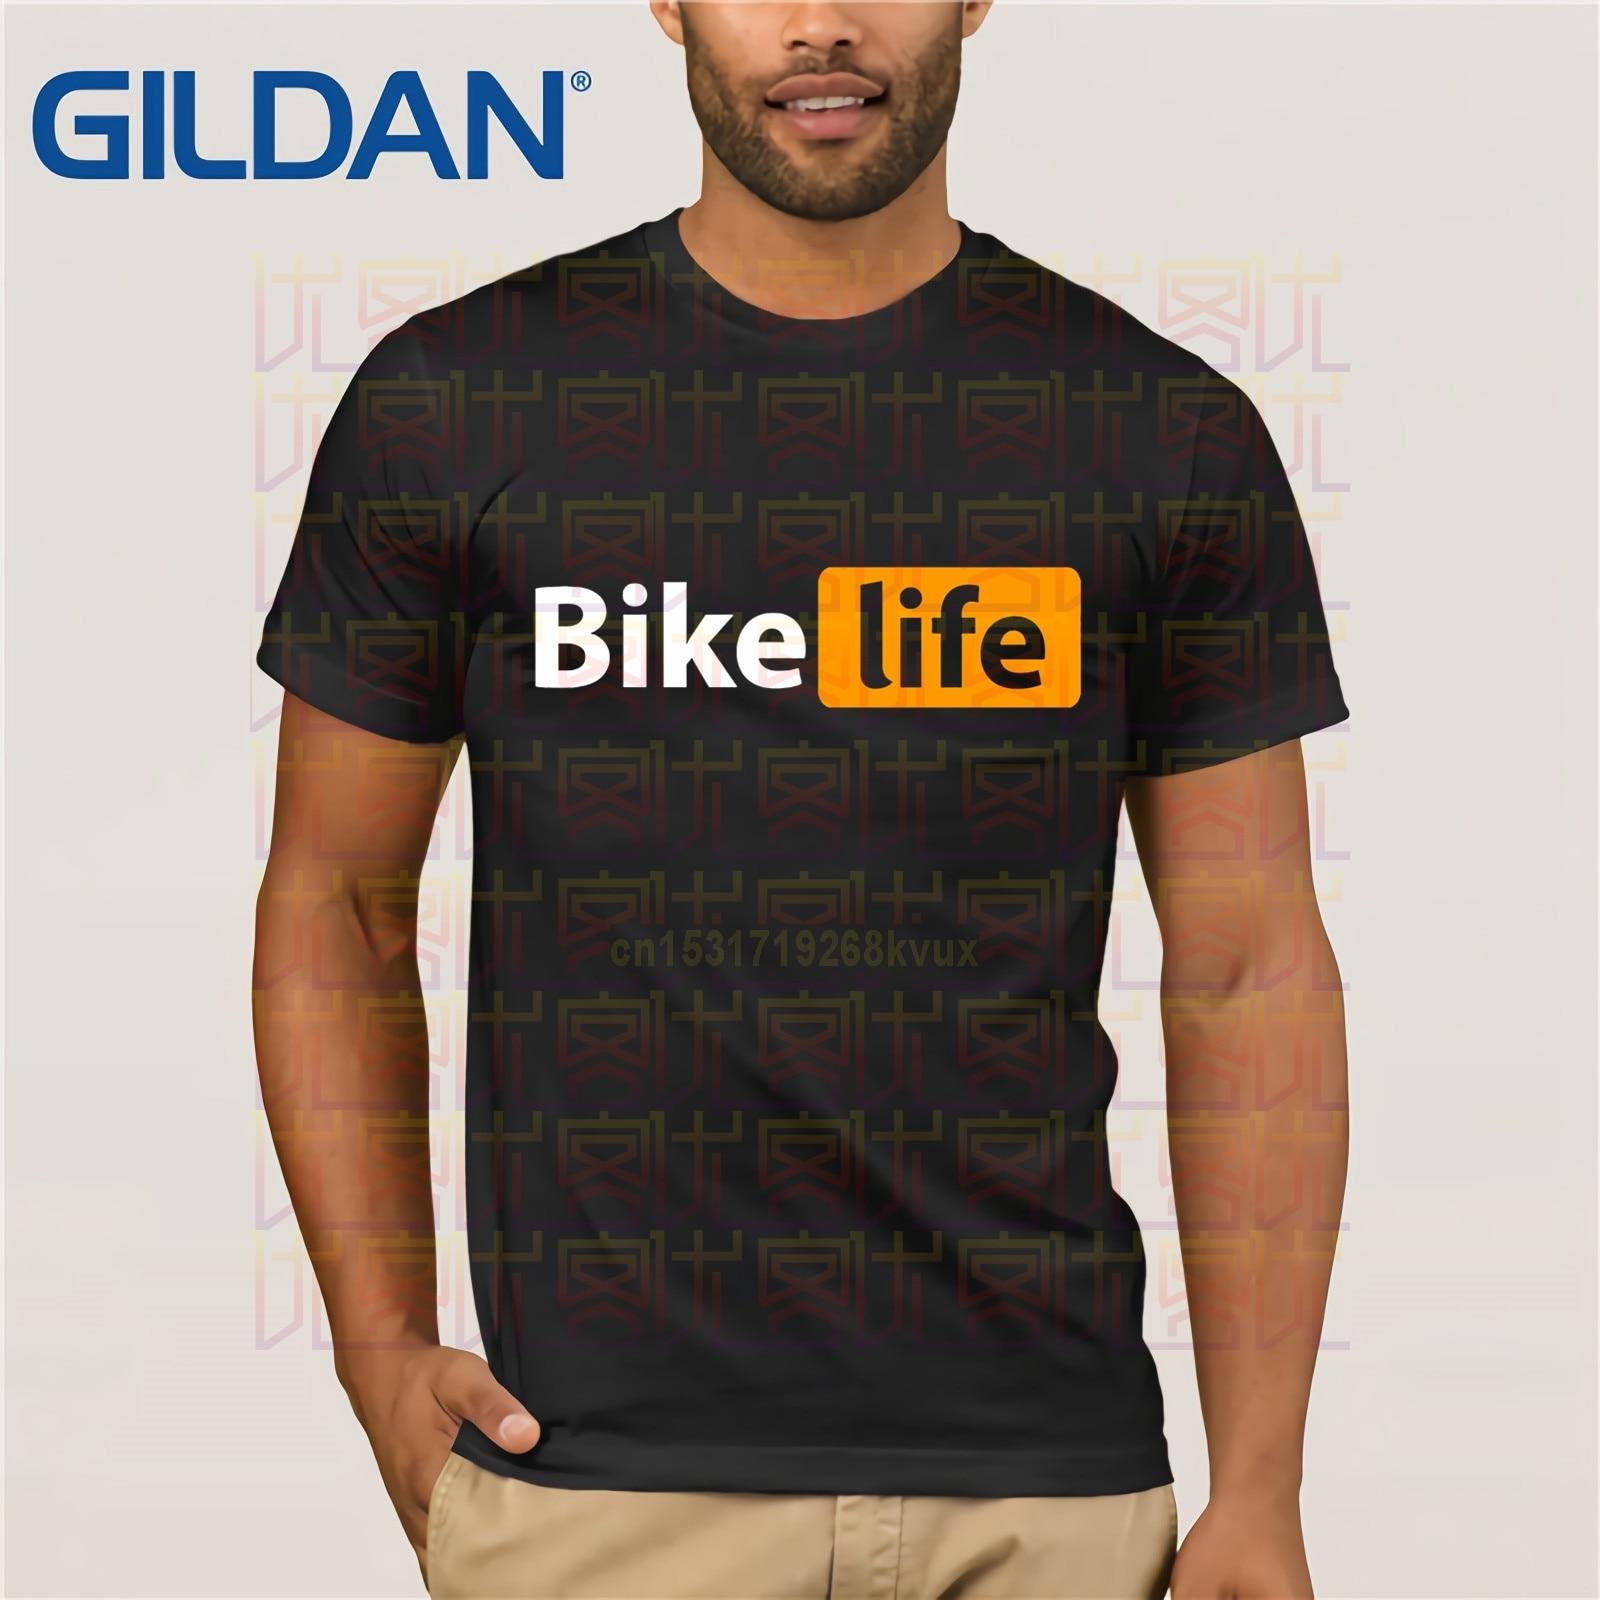 Nuevas camisetas recién llegadas, camiseta con Logo de bicicletas de centro de vida, pantalón corto hecho a medida Hipster para hombres, camisas de manga para adultos